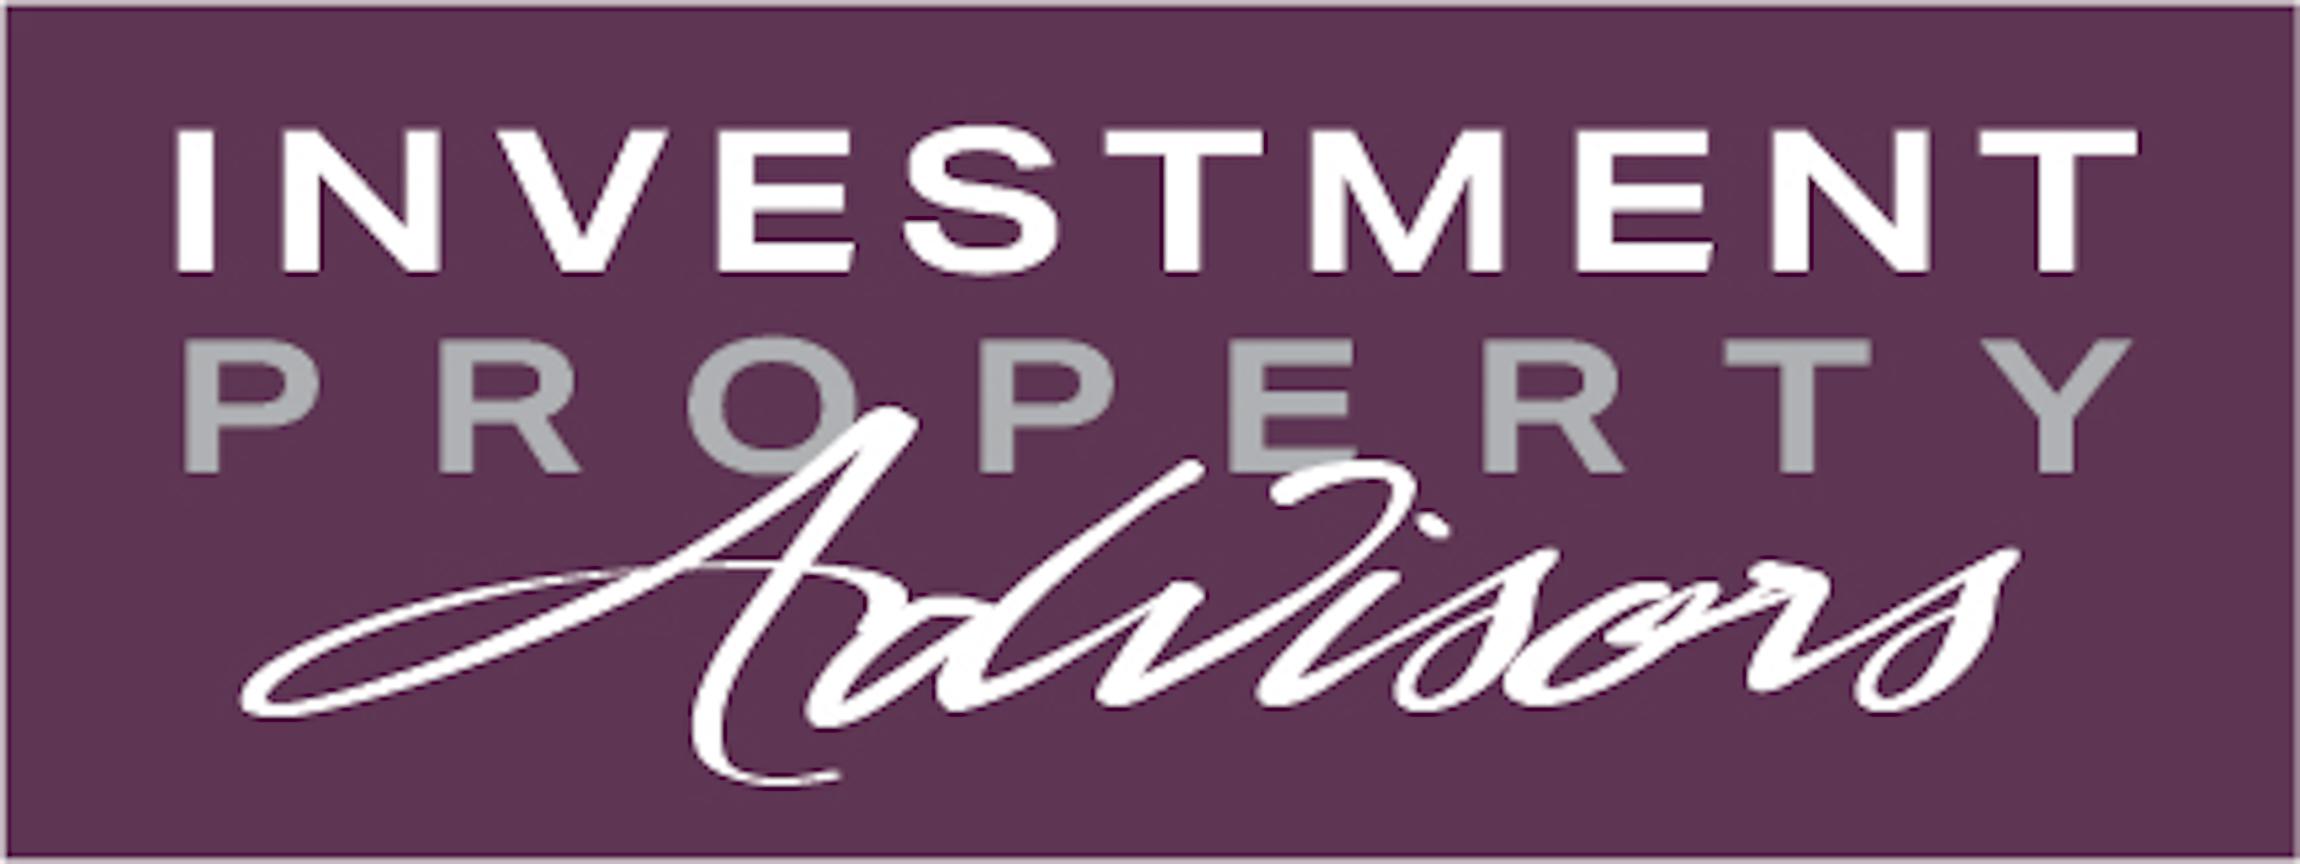 investment property advisors ma